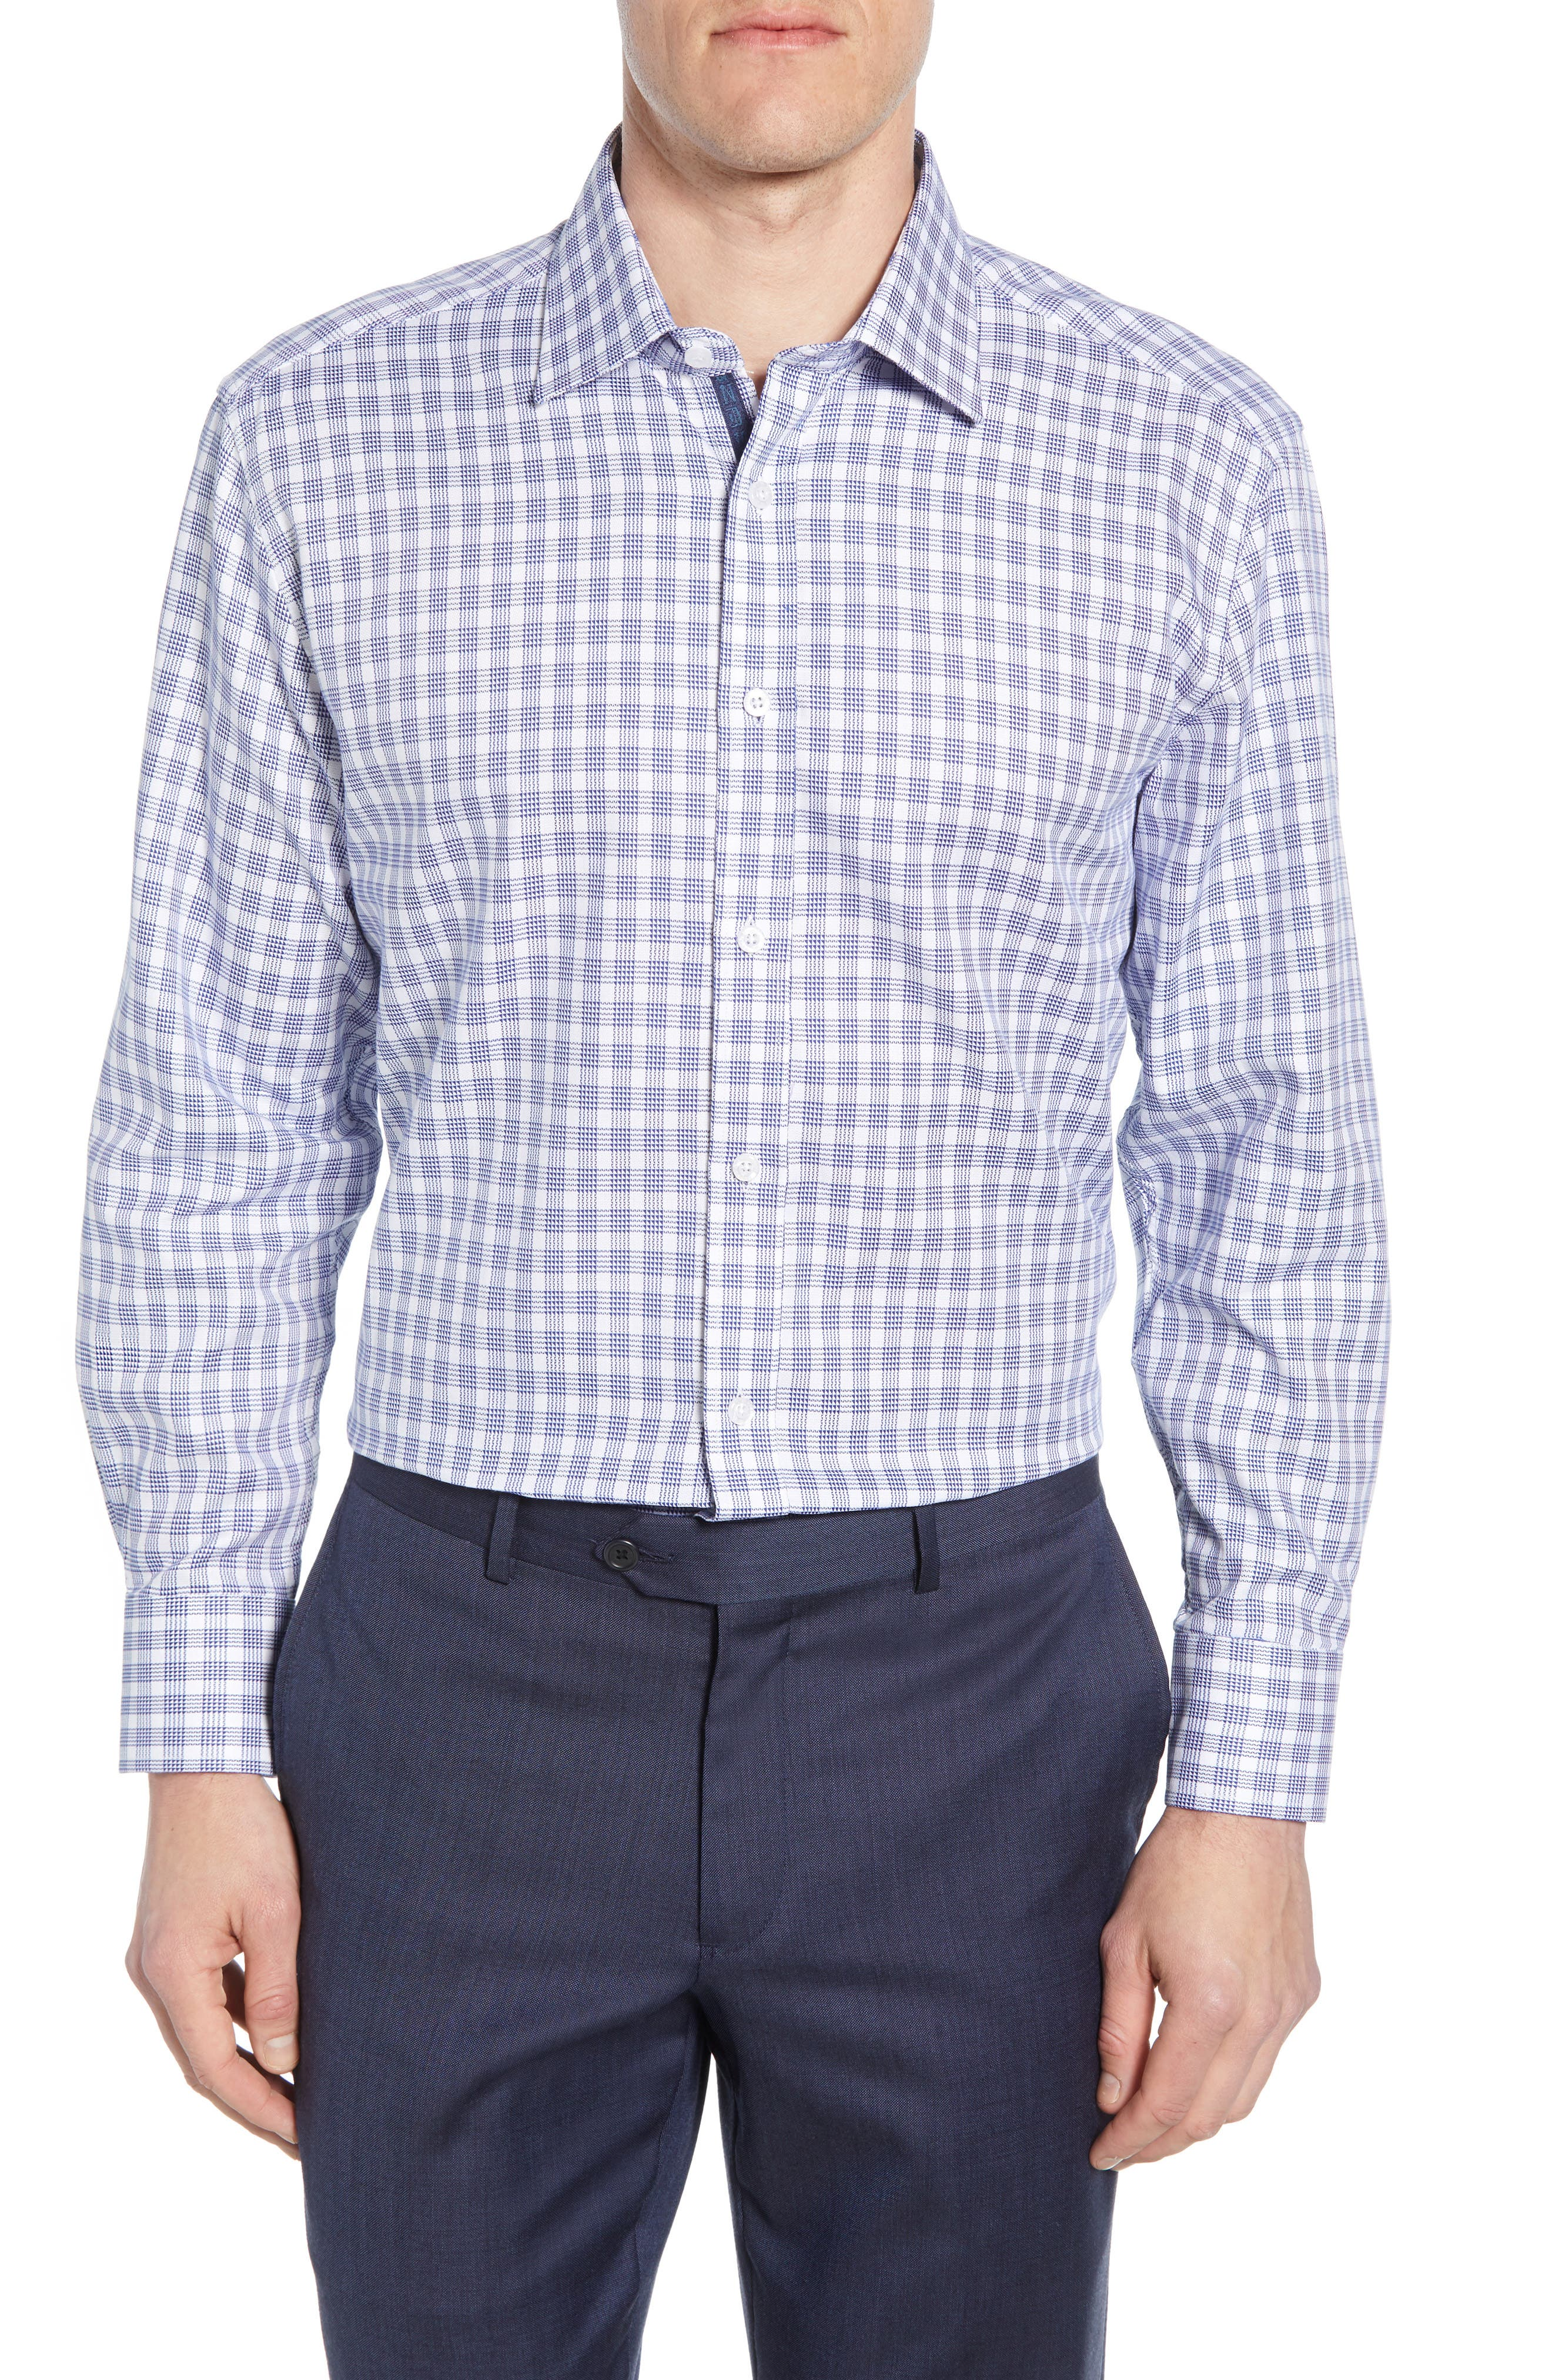 Image of English Laundry Gingham Slim Fit Dress Shirt